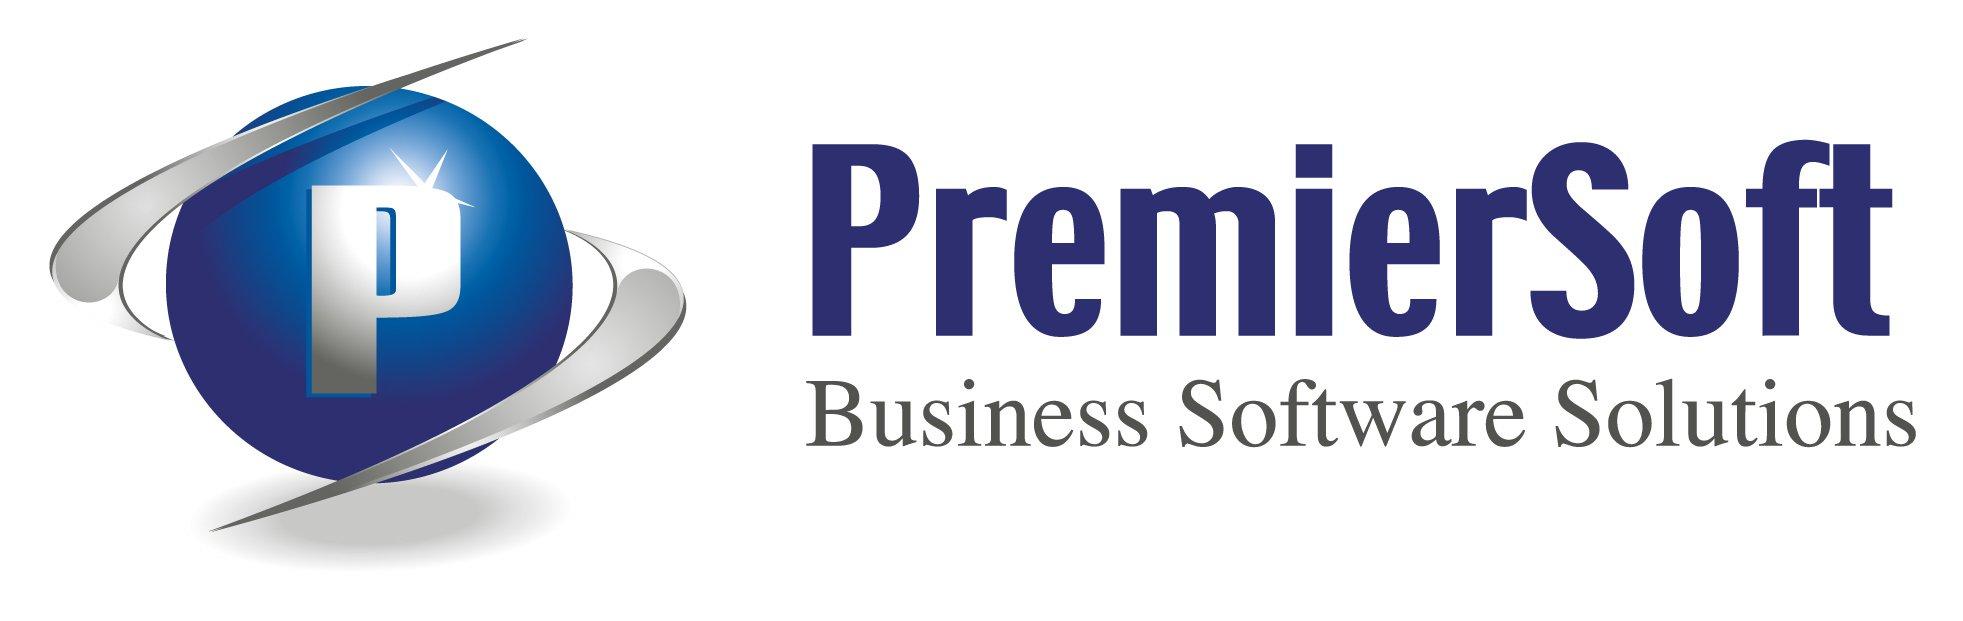 premiersoft logo